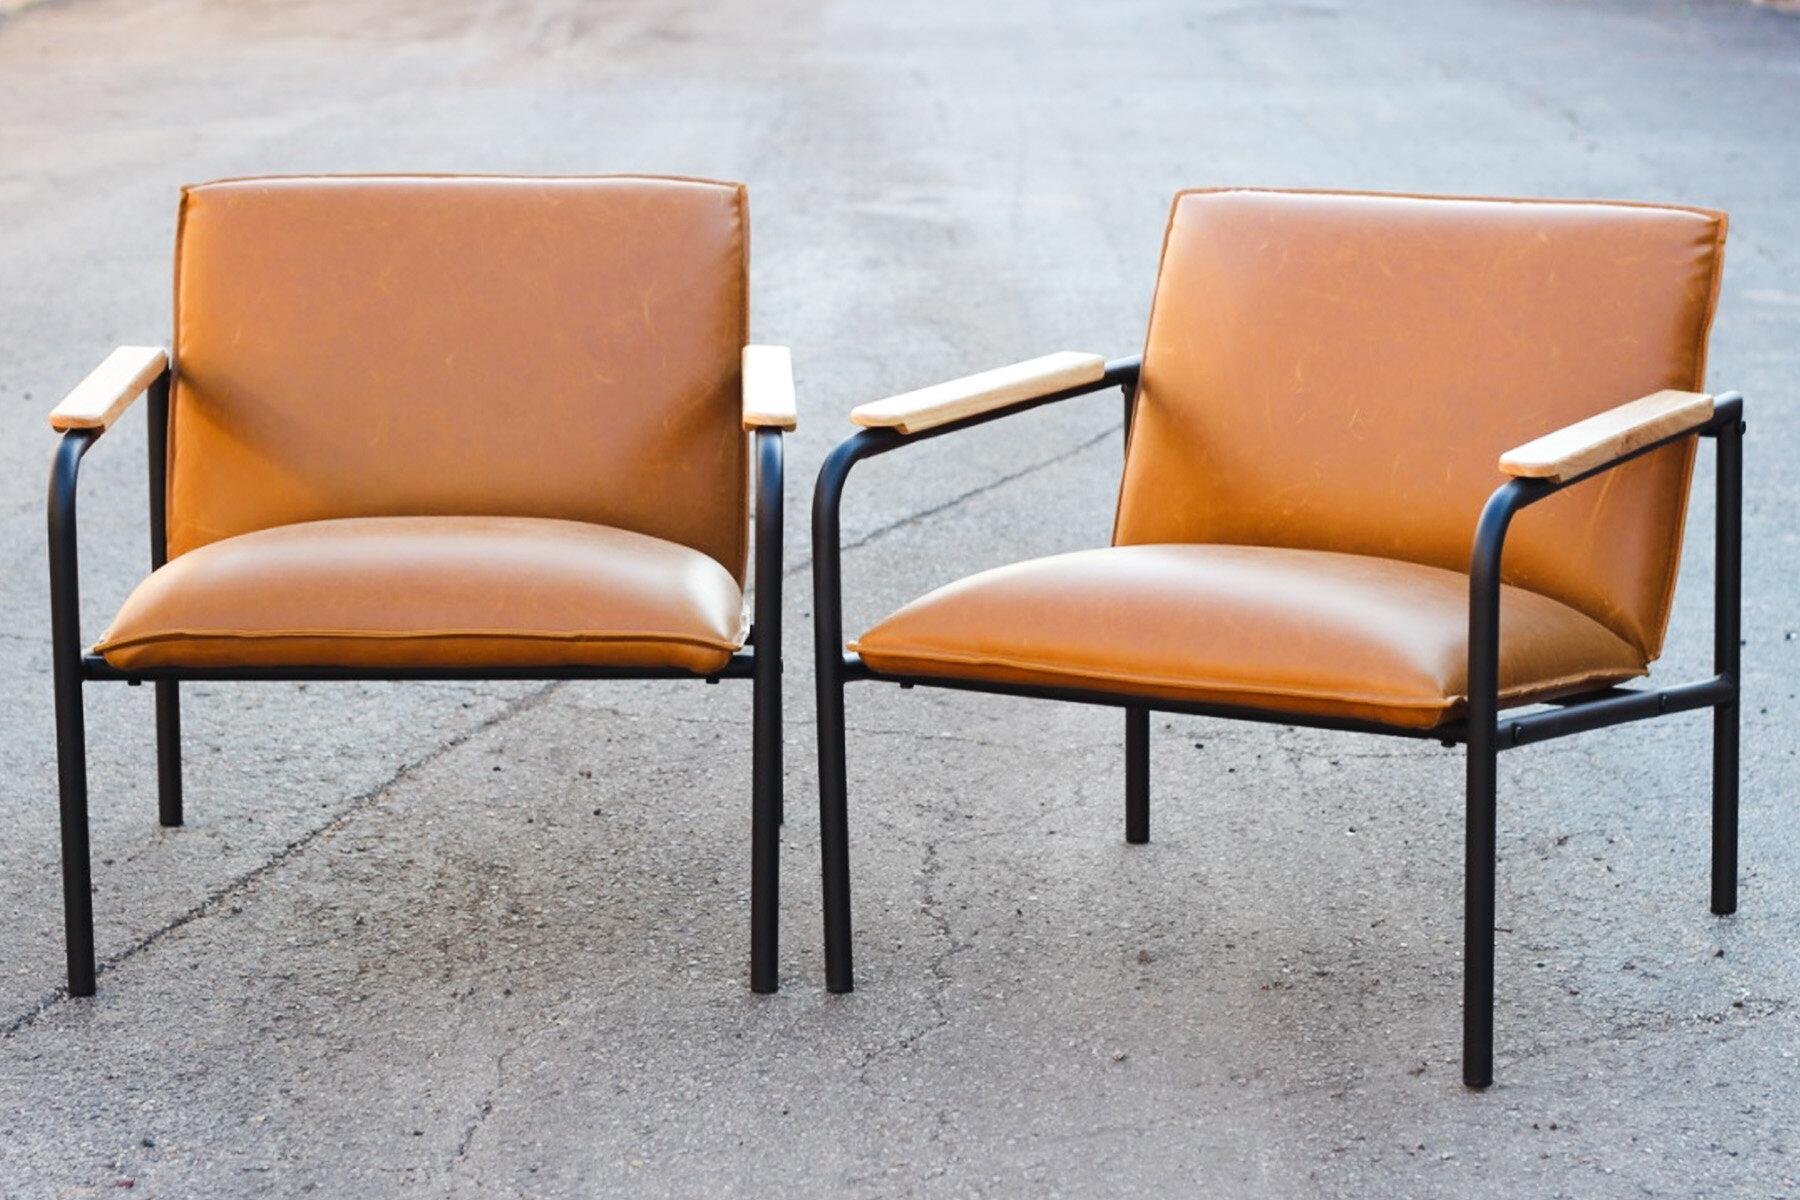 Lawson Chairs - Tulsa Wedding Rentals